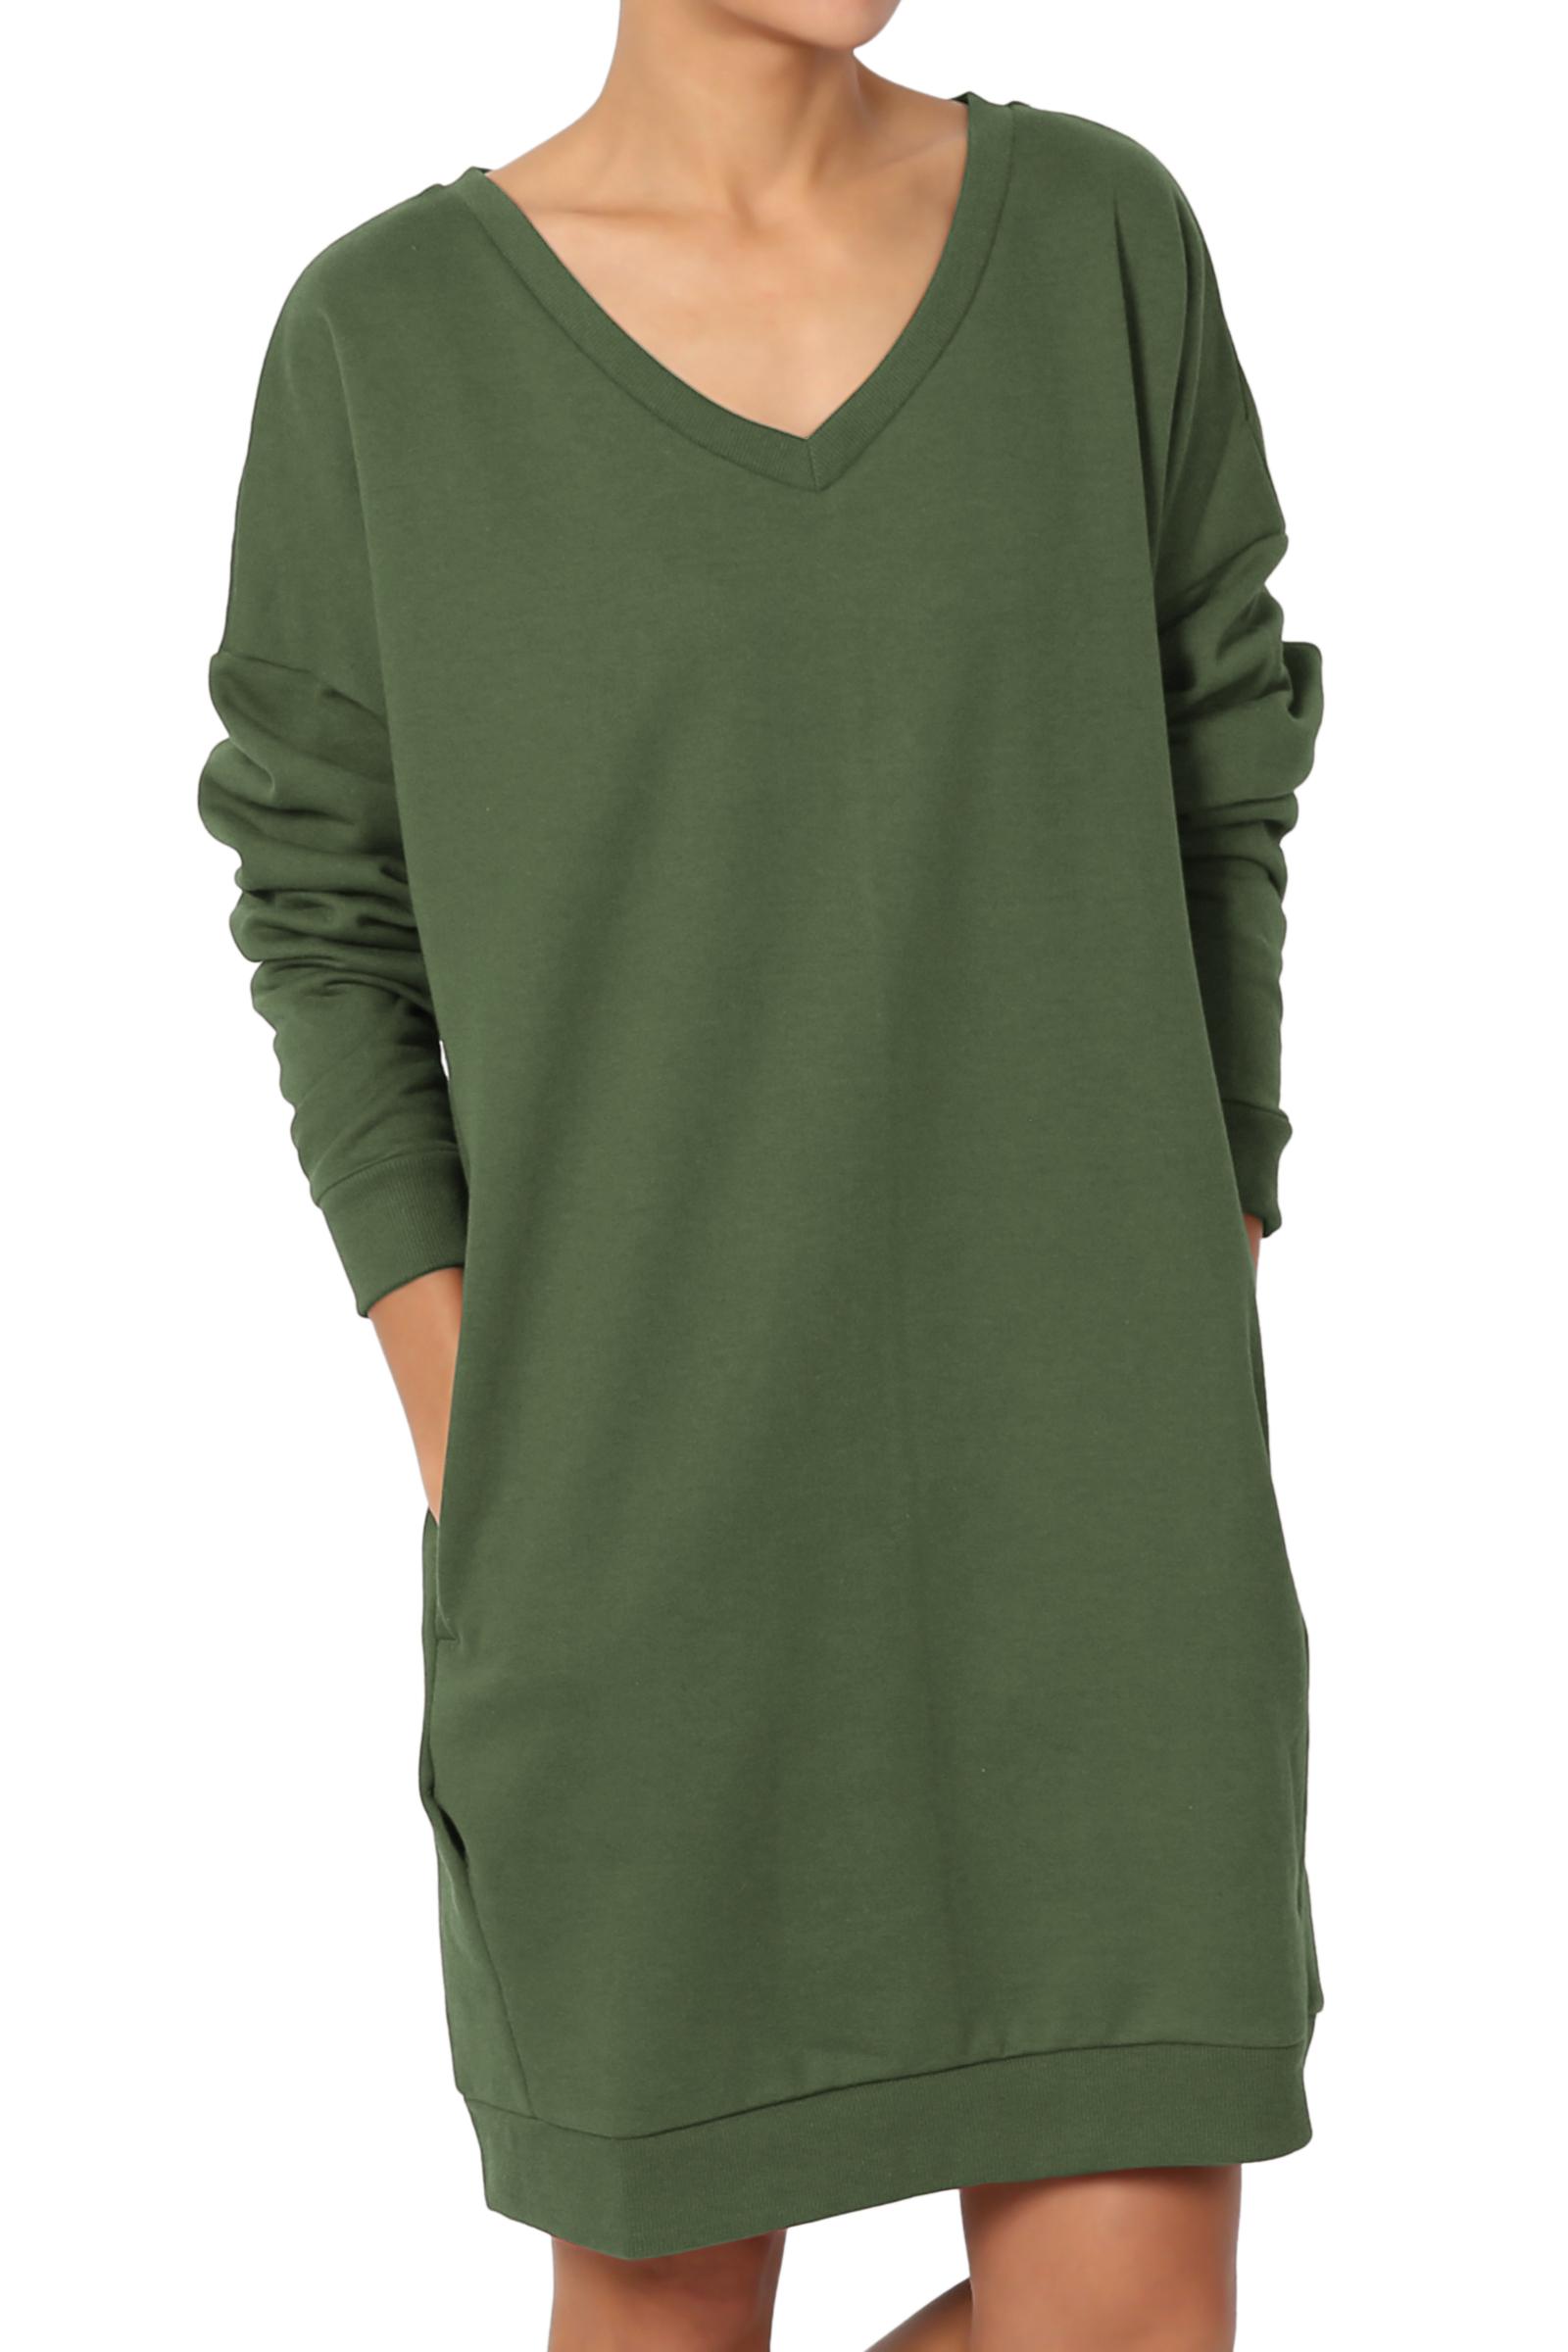 TheMogan Women's S~3X V-Neck Long Sleeve Pocket Oversized Sweatshirts Pullover Tunic